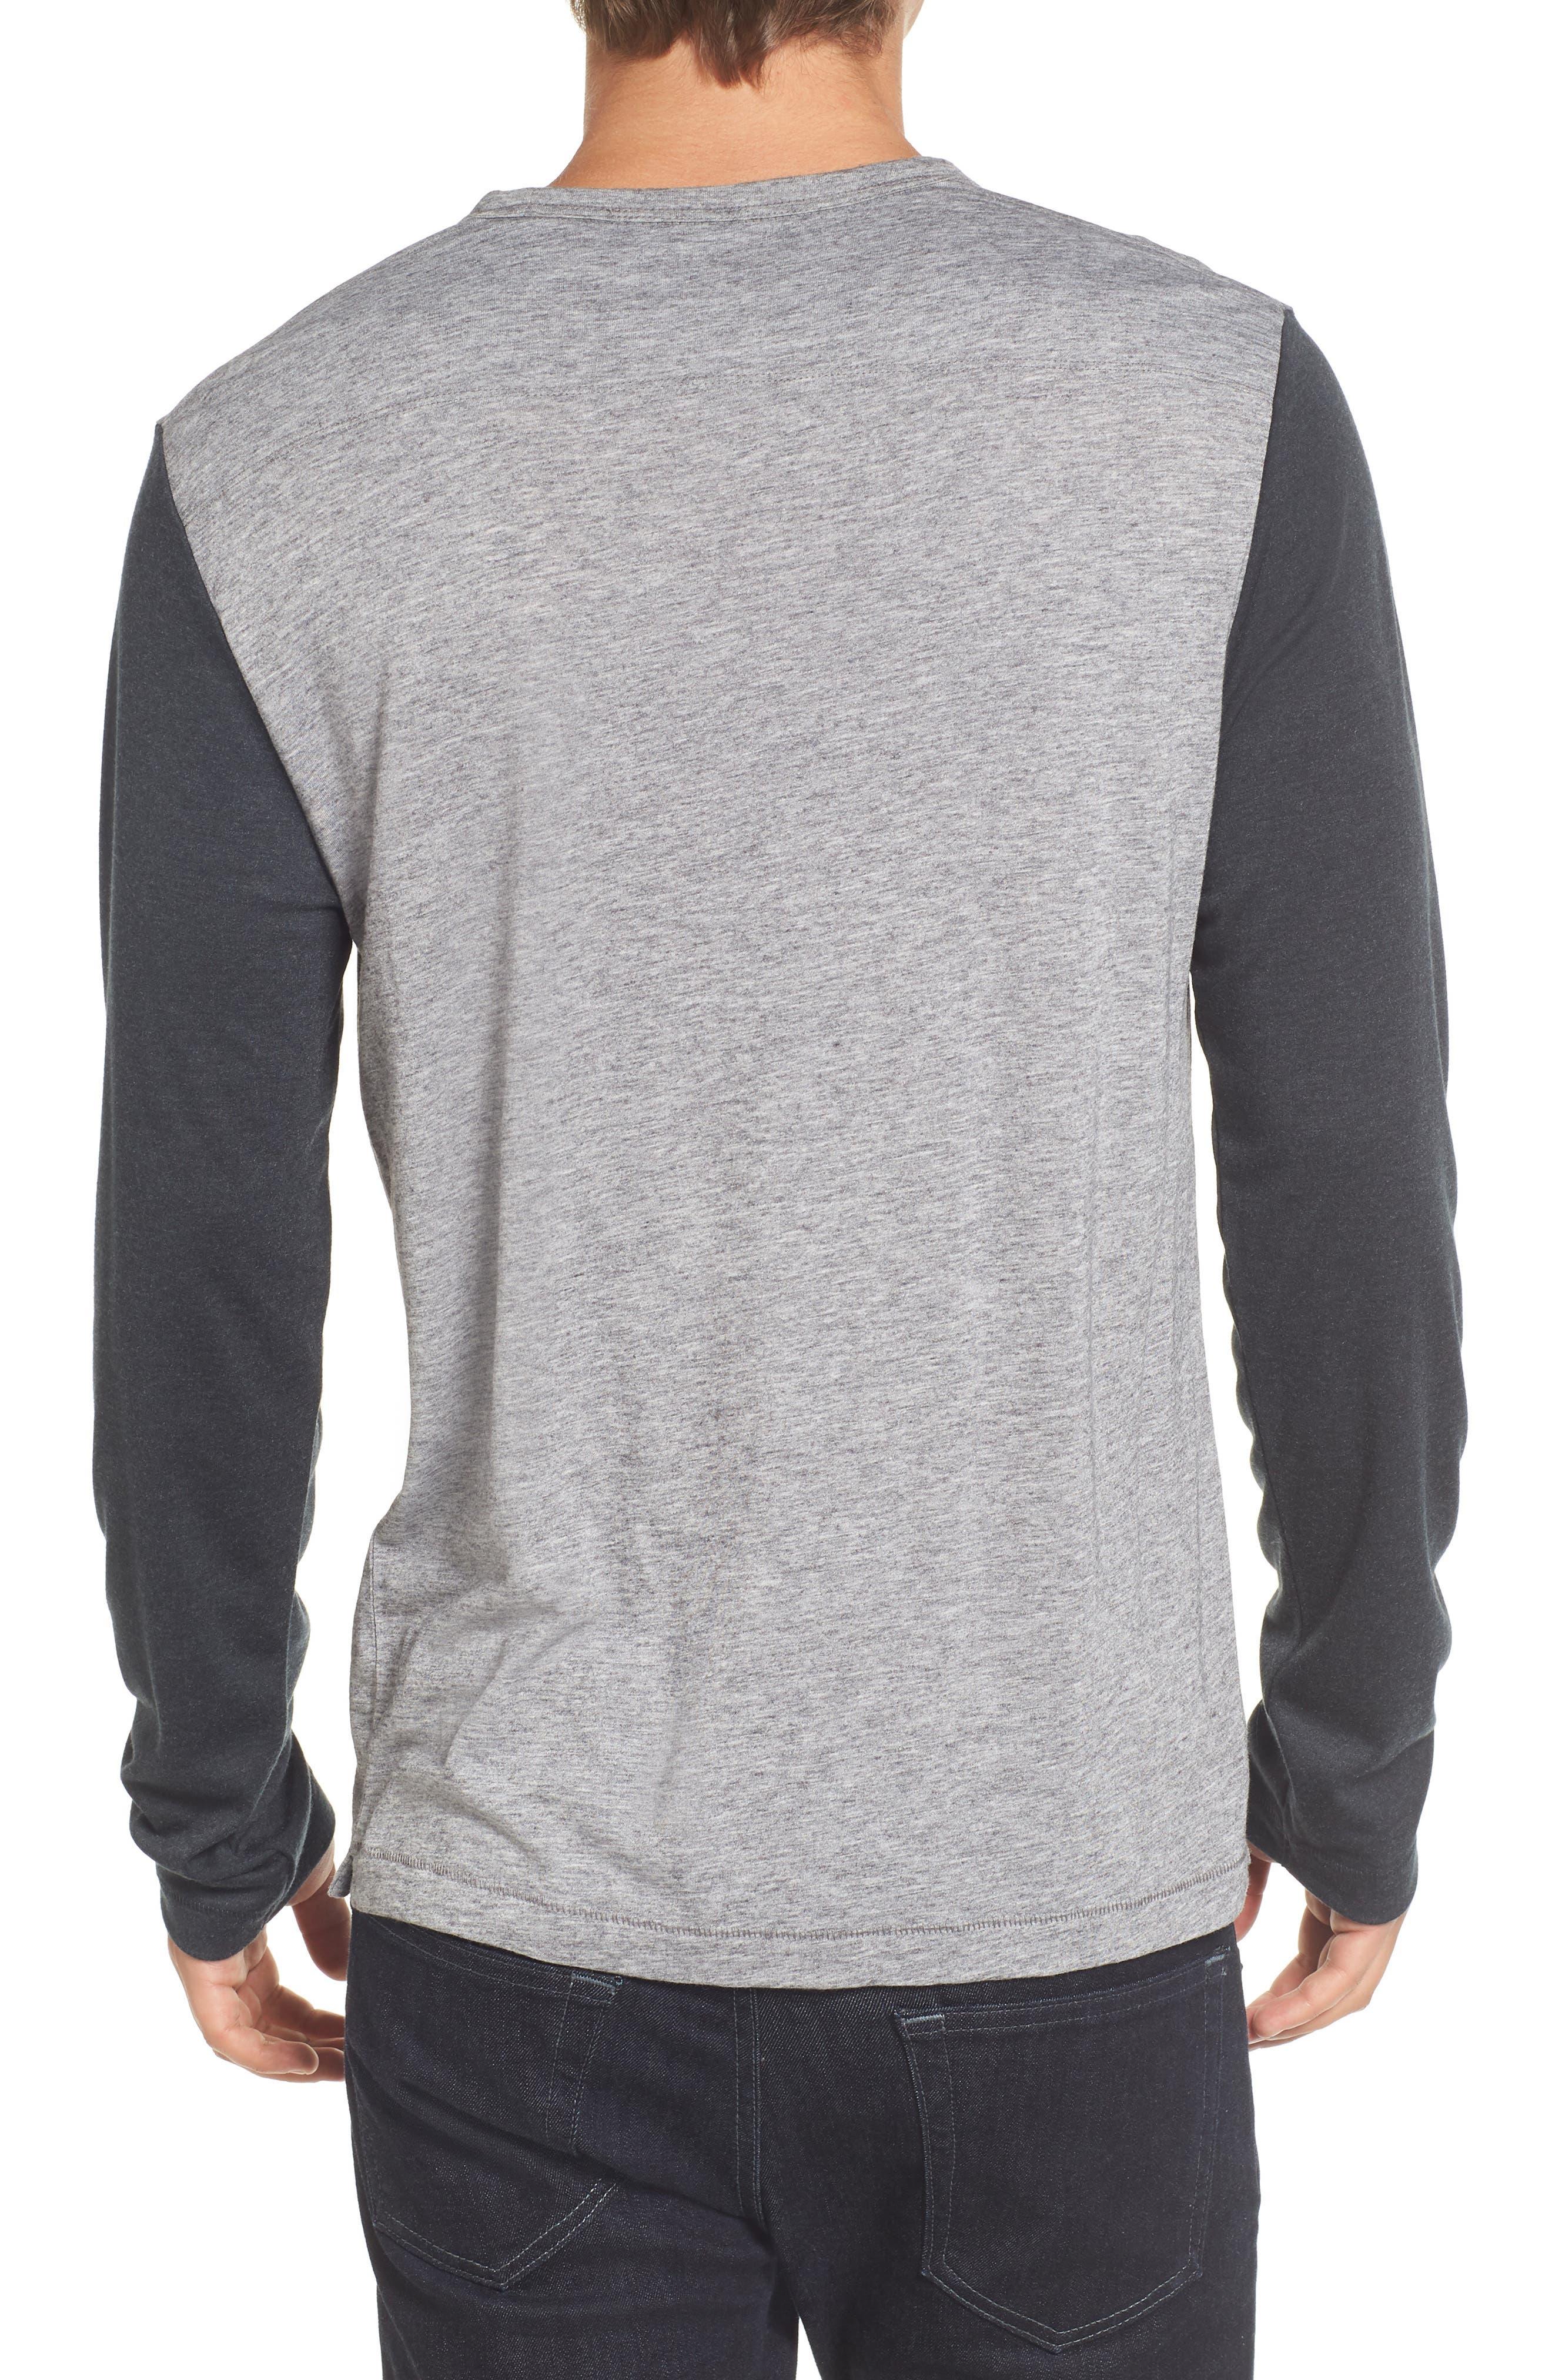 Contrast Long Sleeve T-Shirt,                             Alternate thumbnail 2, color,                             Grey Melange/ Ebony